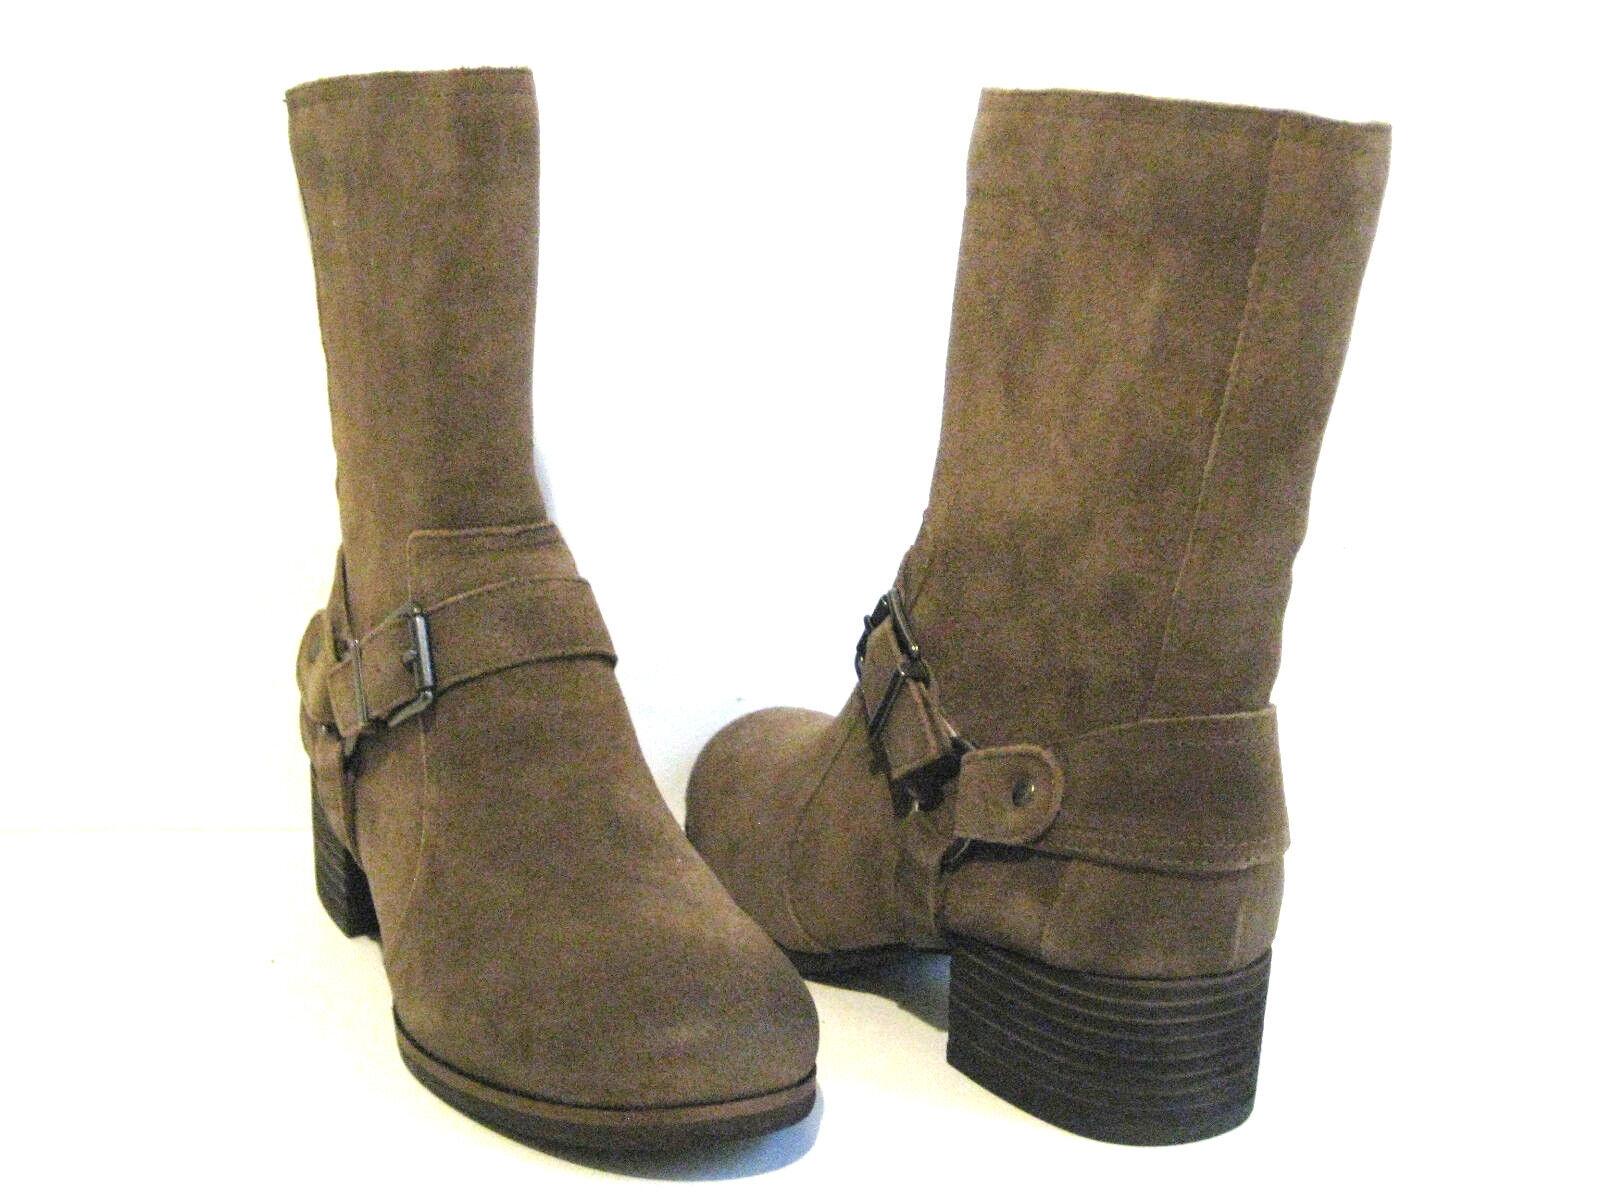 Jessica Simpson annine tabaco Veronica Gamuza botas botas botas Mujer Talla 8 M  compras de moda online